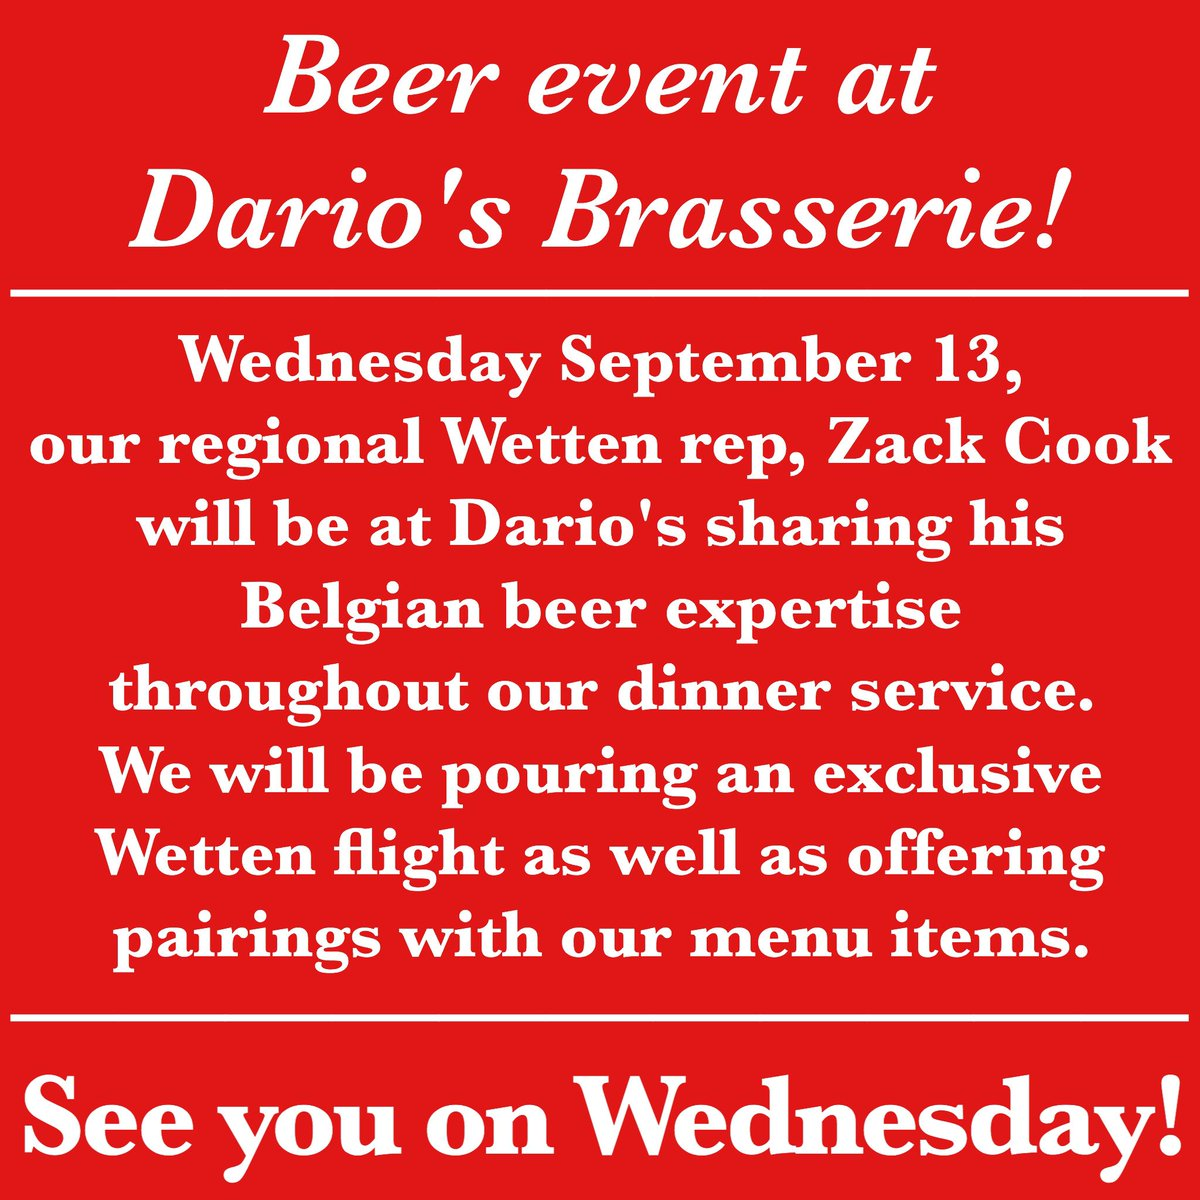 It's happening in 30! Stop by tonight for some great @WettenImporters beer! #omaha #brasserie #beer #bestbeerlistintown